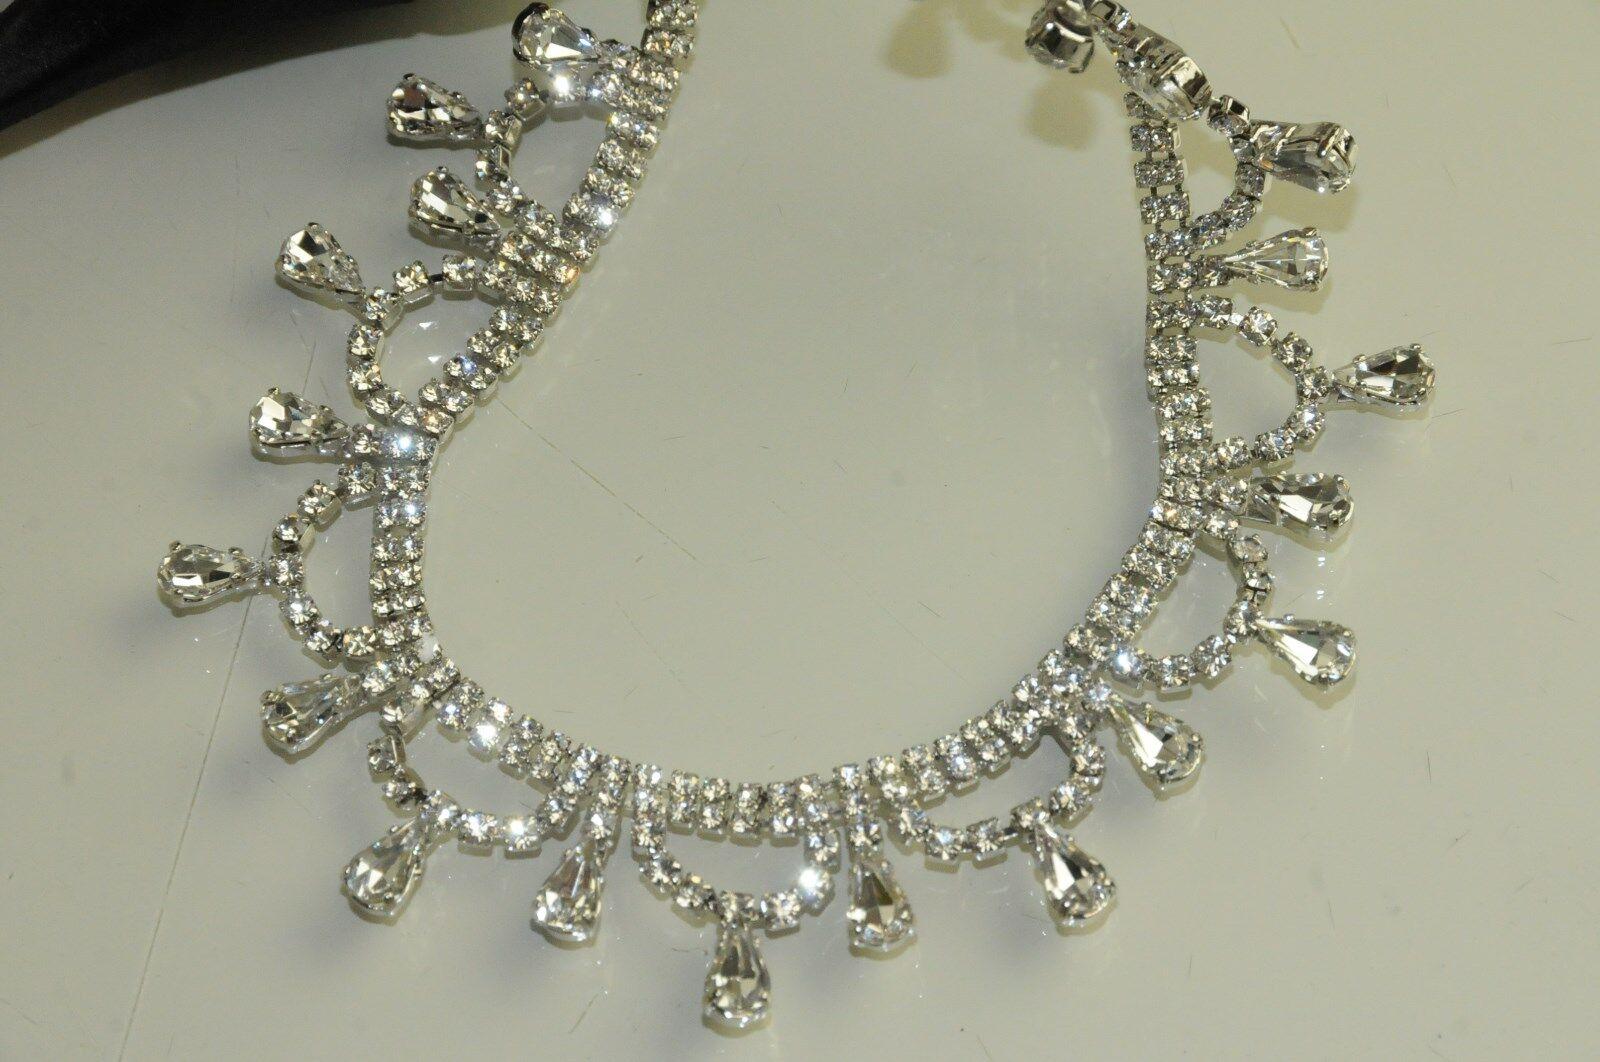 Neu Manolo Blahnik Schwarzer Satin Houristra Crystal Crystal Crystal Jeweled Sandalen Eve Schuhe 2b8be1